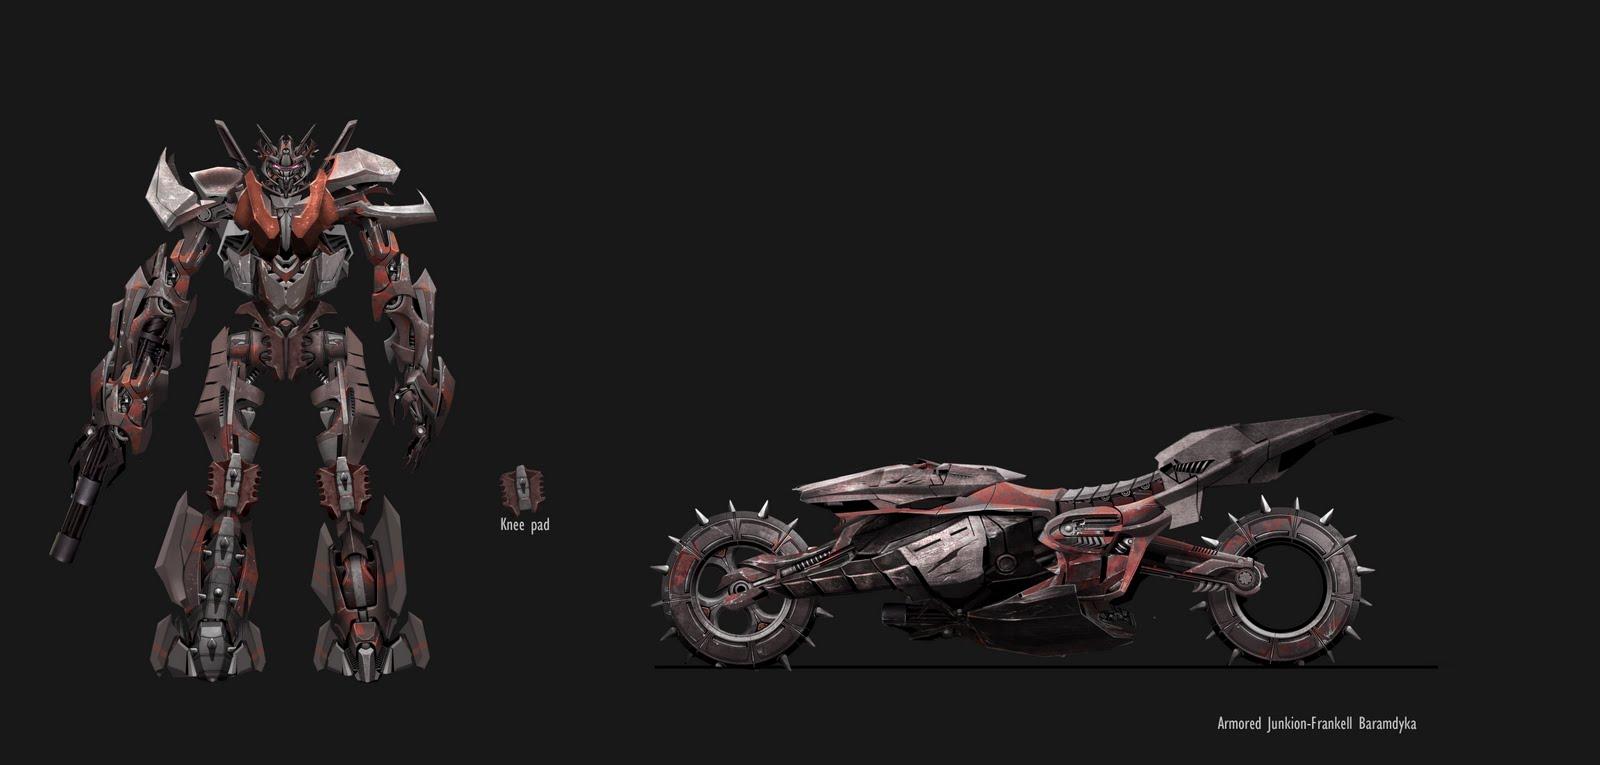 Transformers 3 concept art | Image